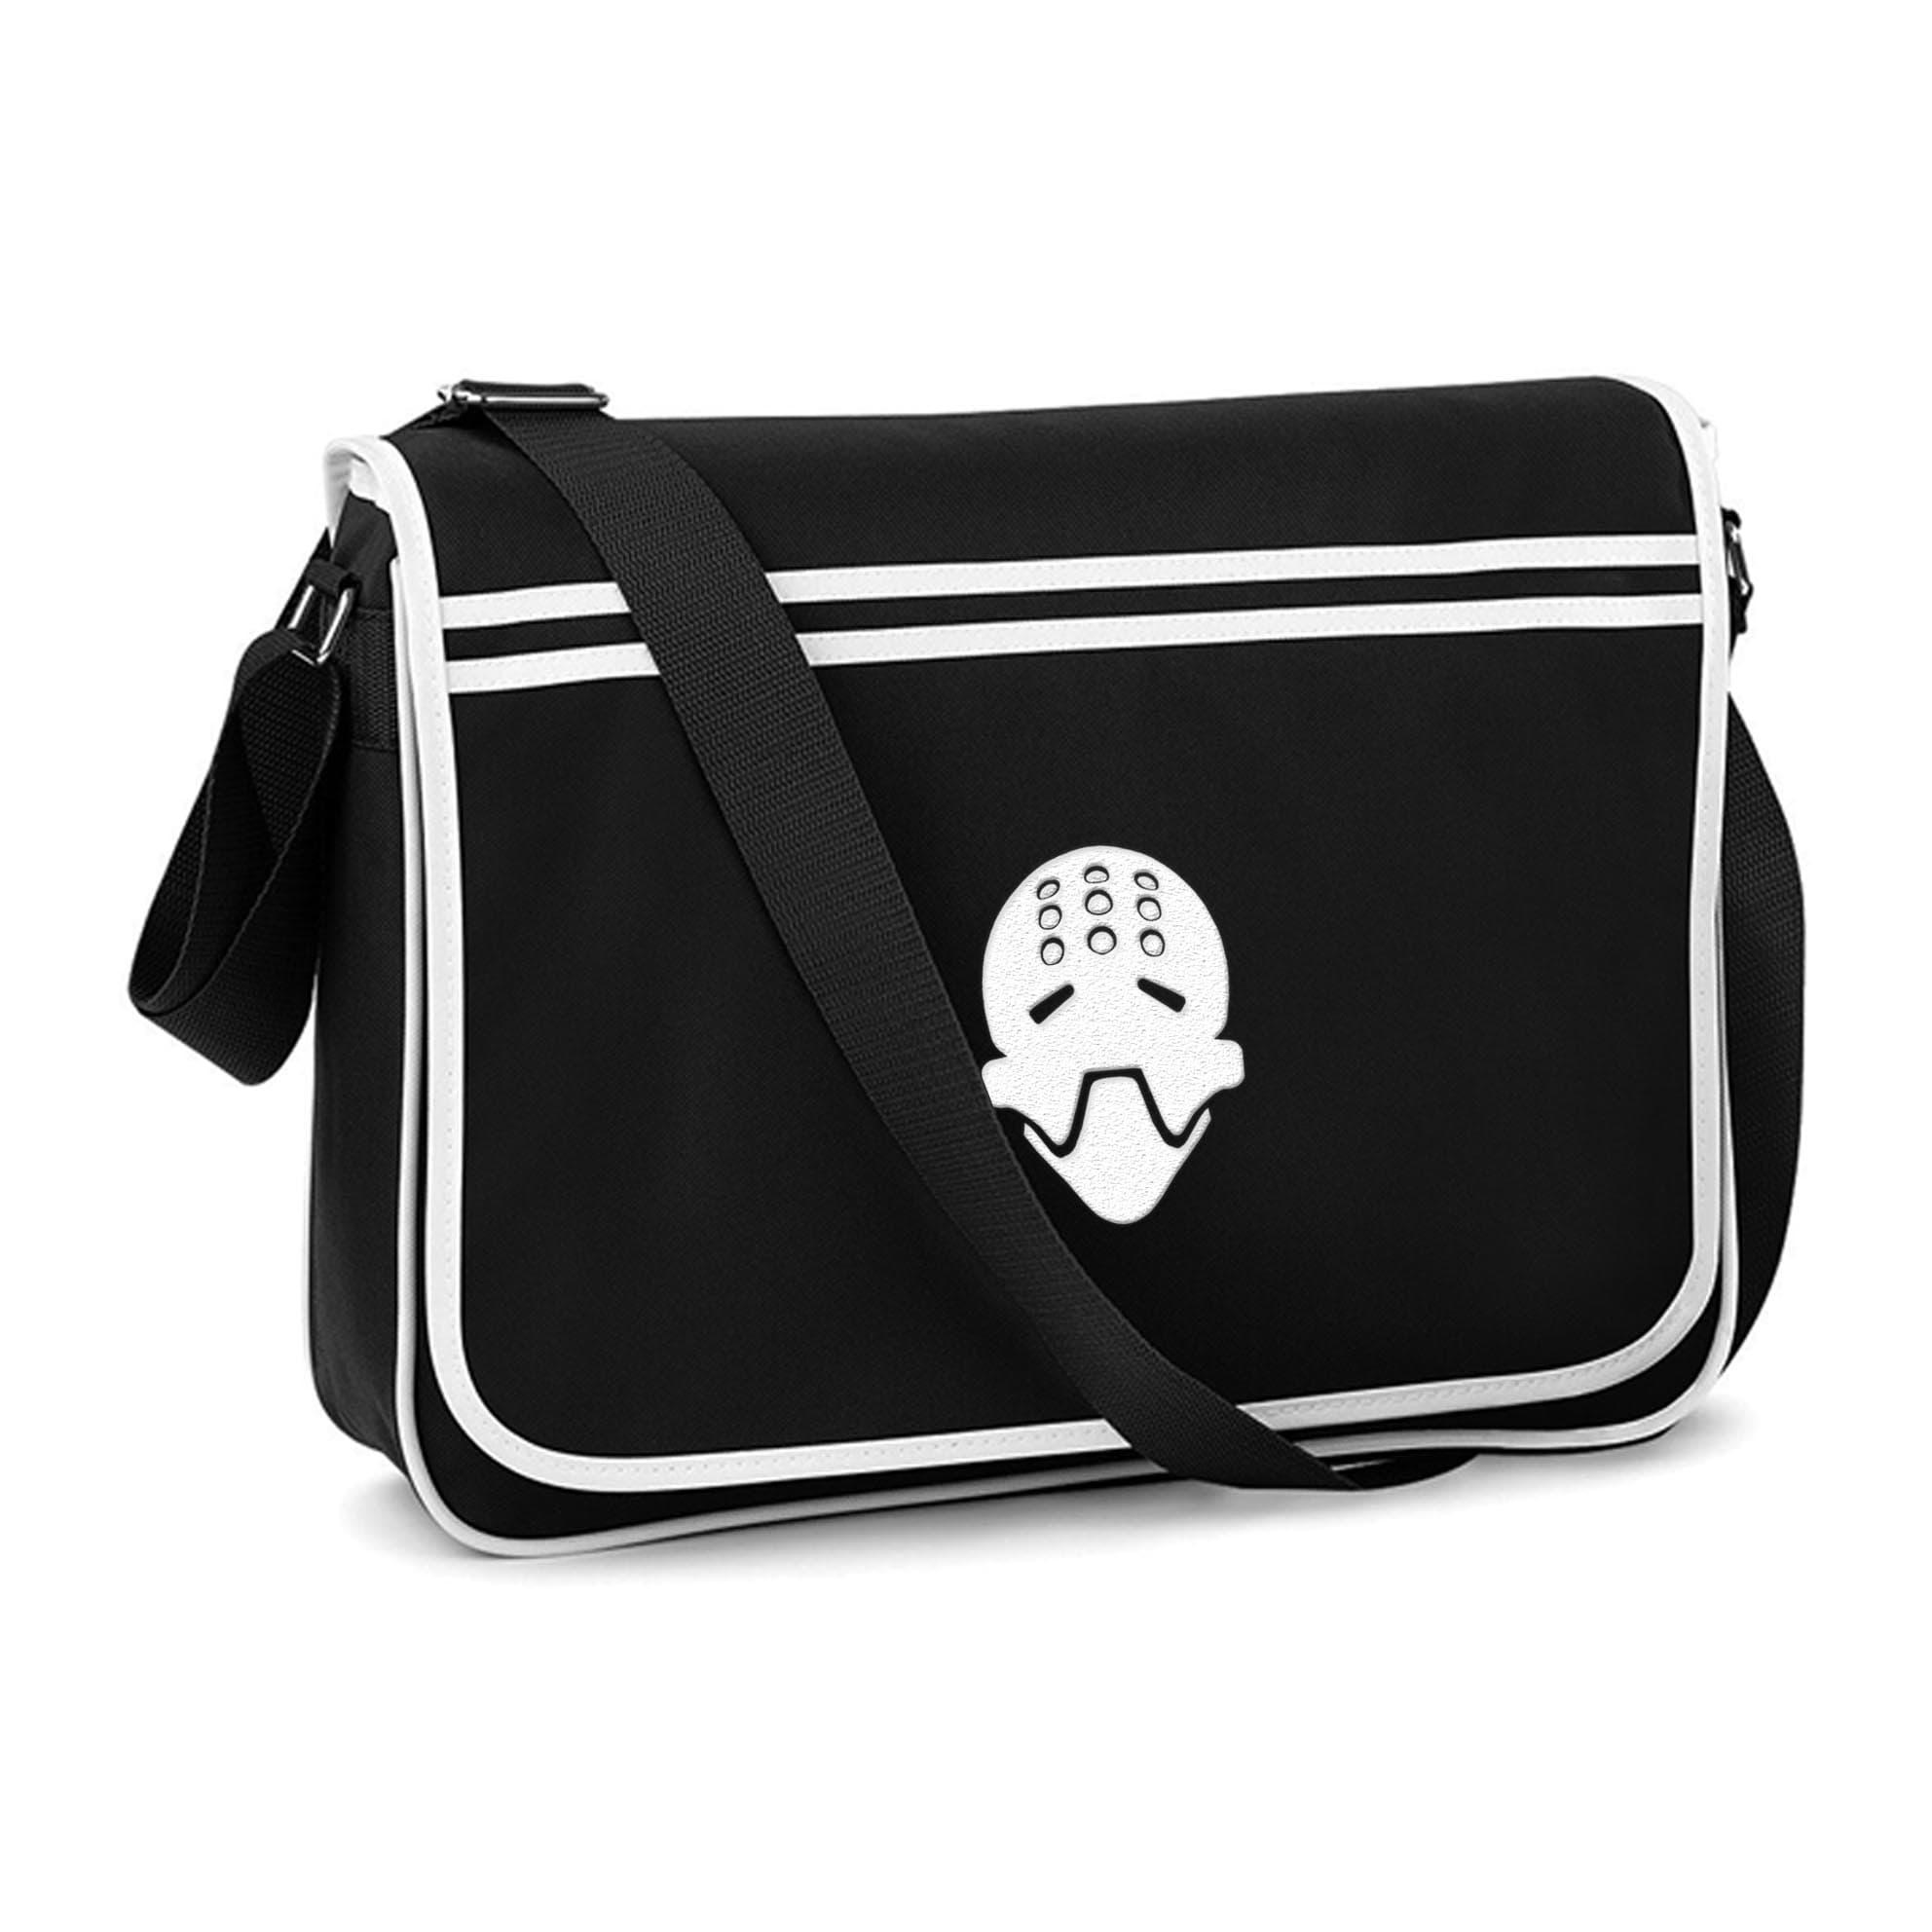 Overwatch Zenyetta Messenger Bag